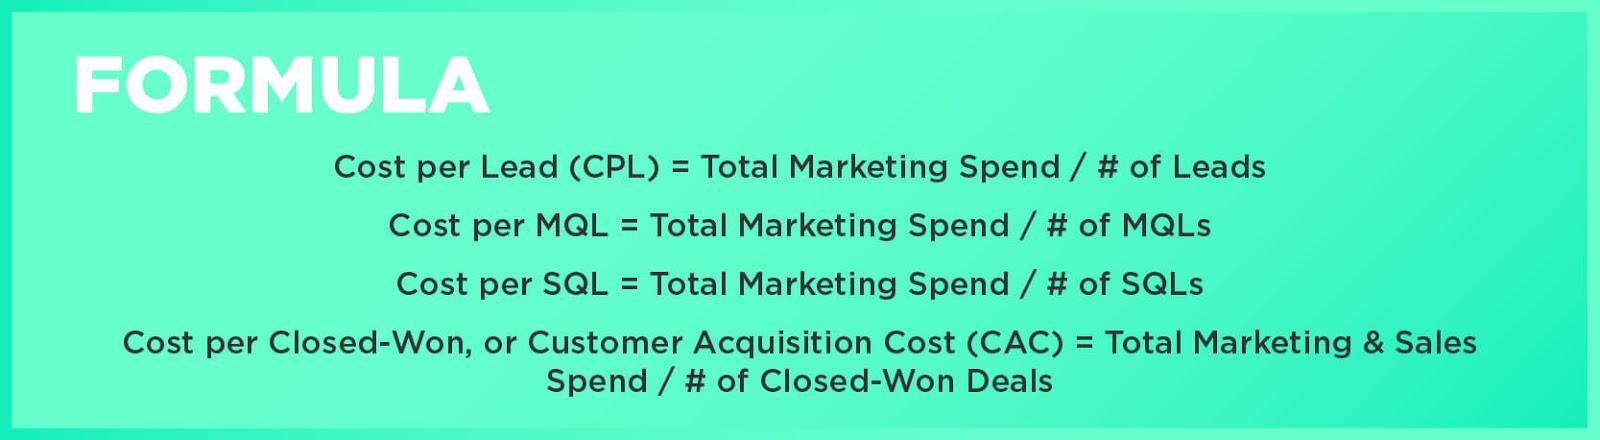 Formula: Cost per Lead (CPL) = Total Marketing Spend / # of LeadsCost per MQL = Total Marketing Spend / # of MQLsCost per SQL = Total Marketing Spend / # of SQLsCost per Closed-Won, or Customer Acquisition Cost (CAC) = Total Marketing & Sales Spend / # of Closed-Won Deals